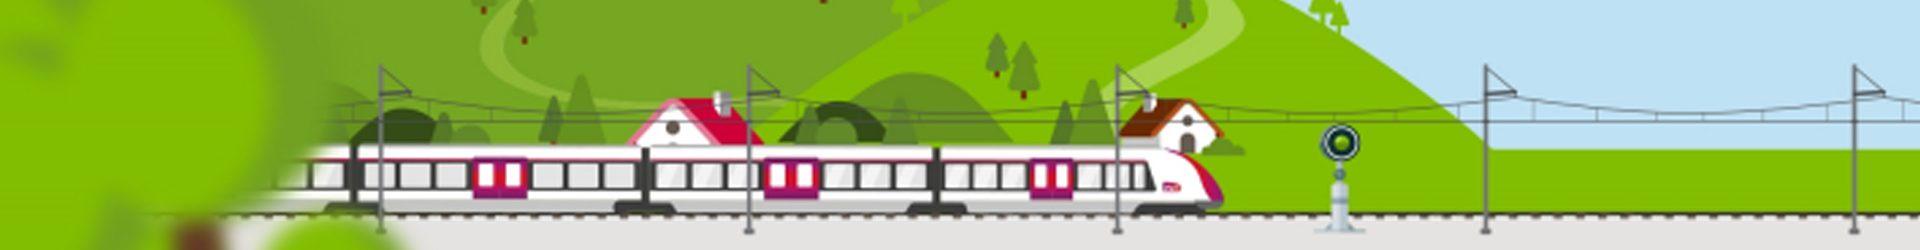 SNCF Reseau - Motion Design